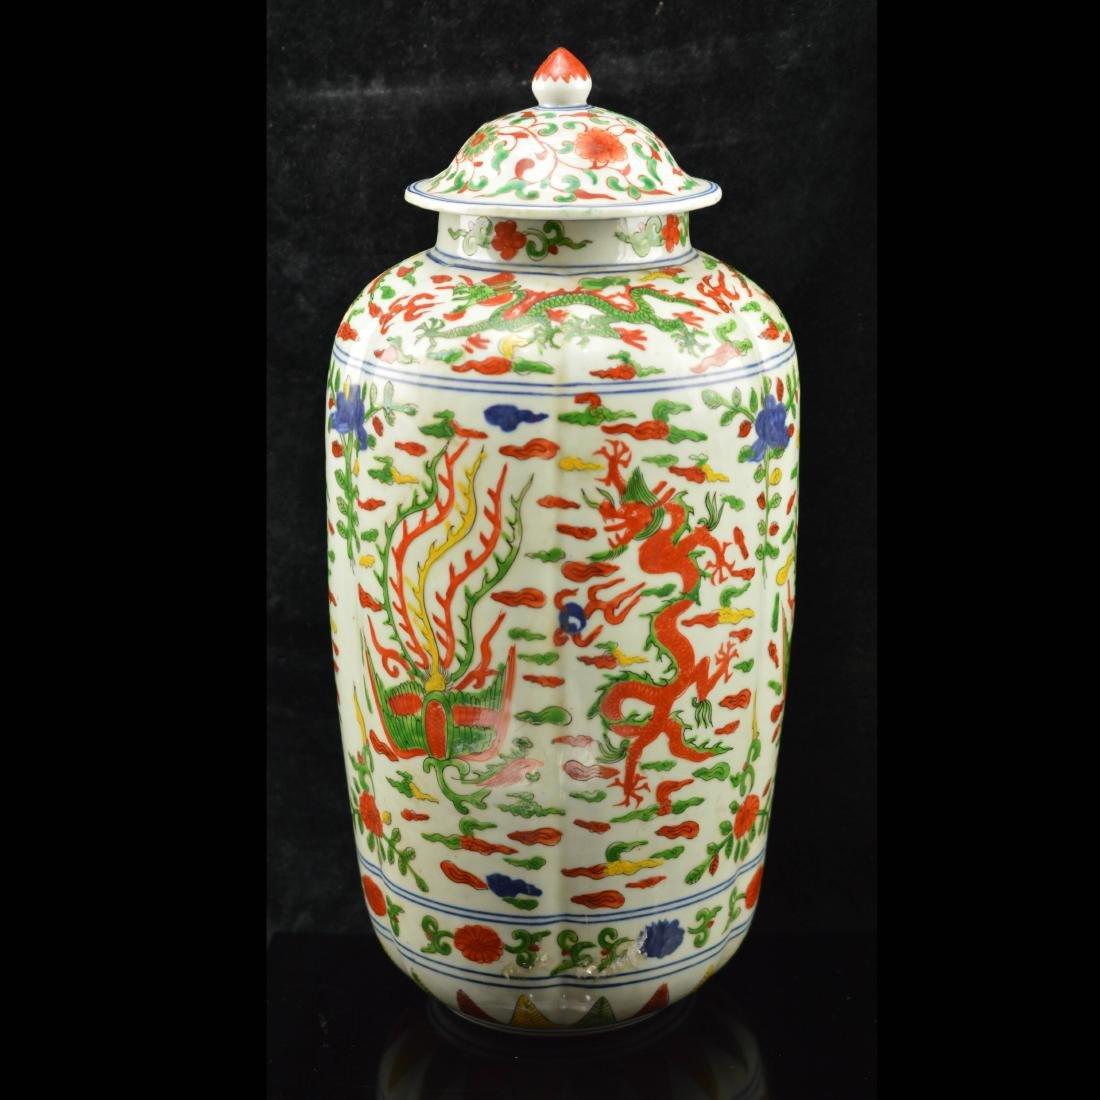 Five color porcelain jar